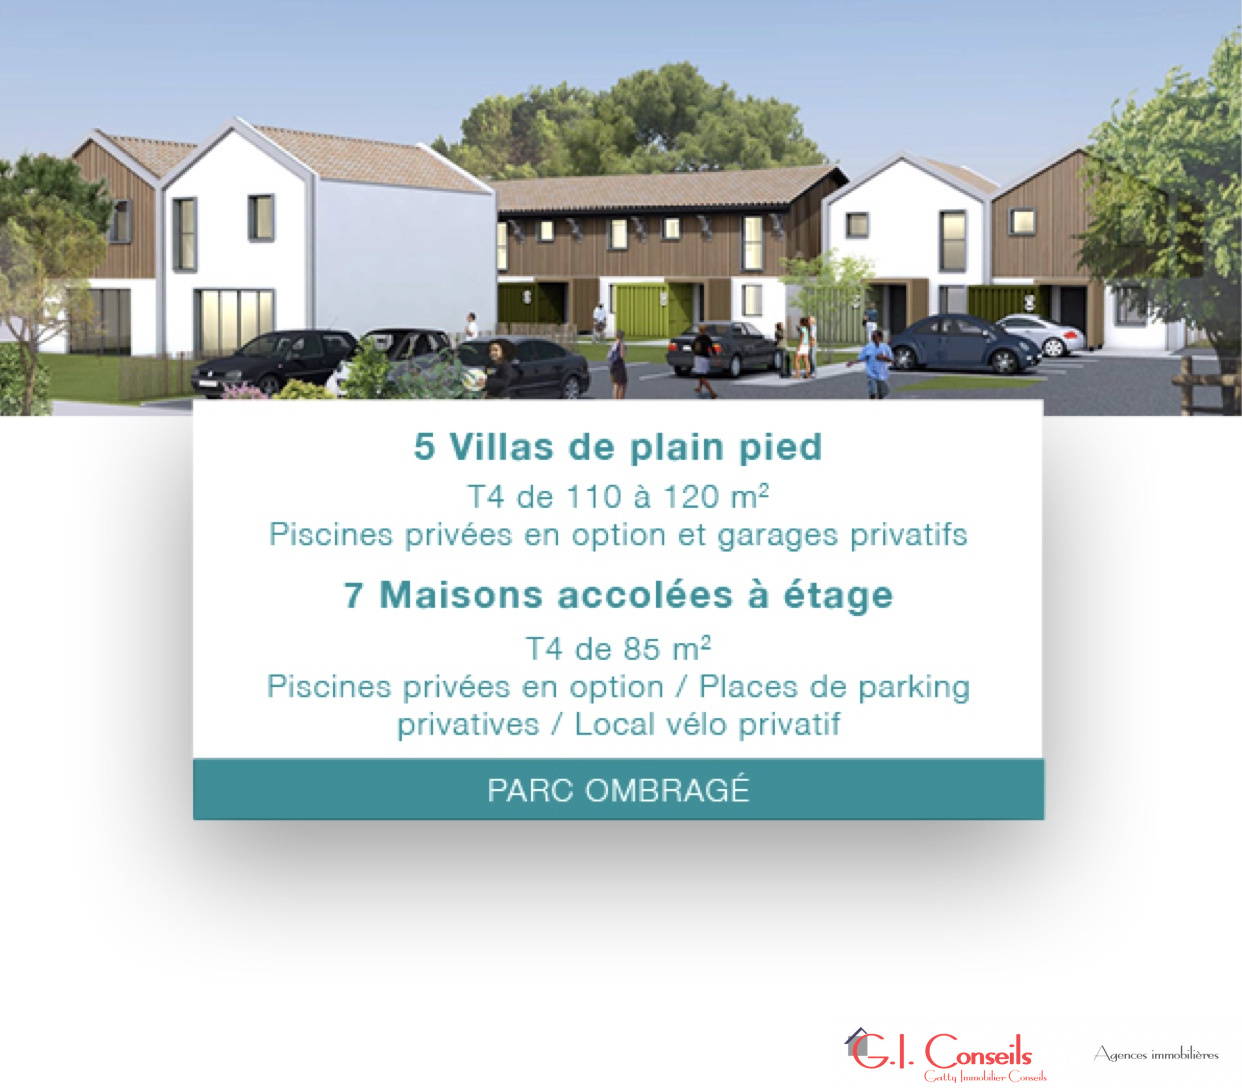 Vente maisons neuves rt2012 en vefa for Prix m2 maison neuve rt 2012